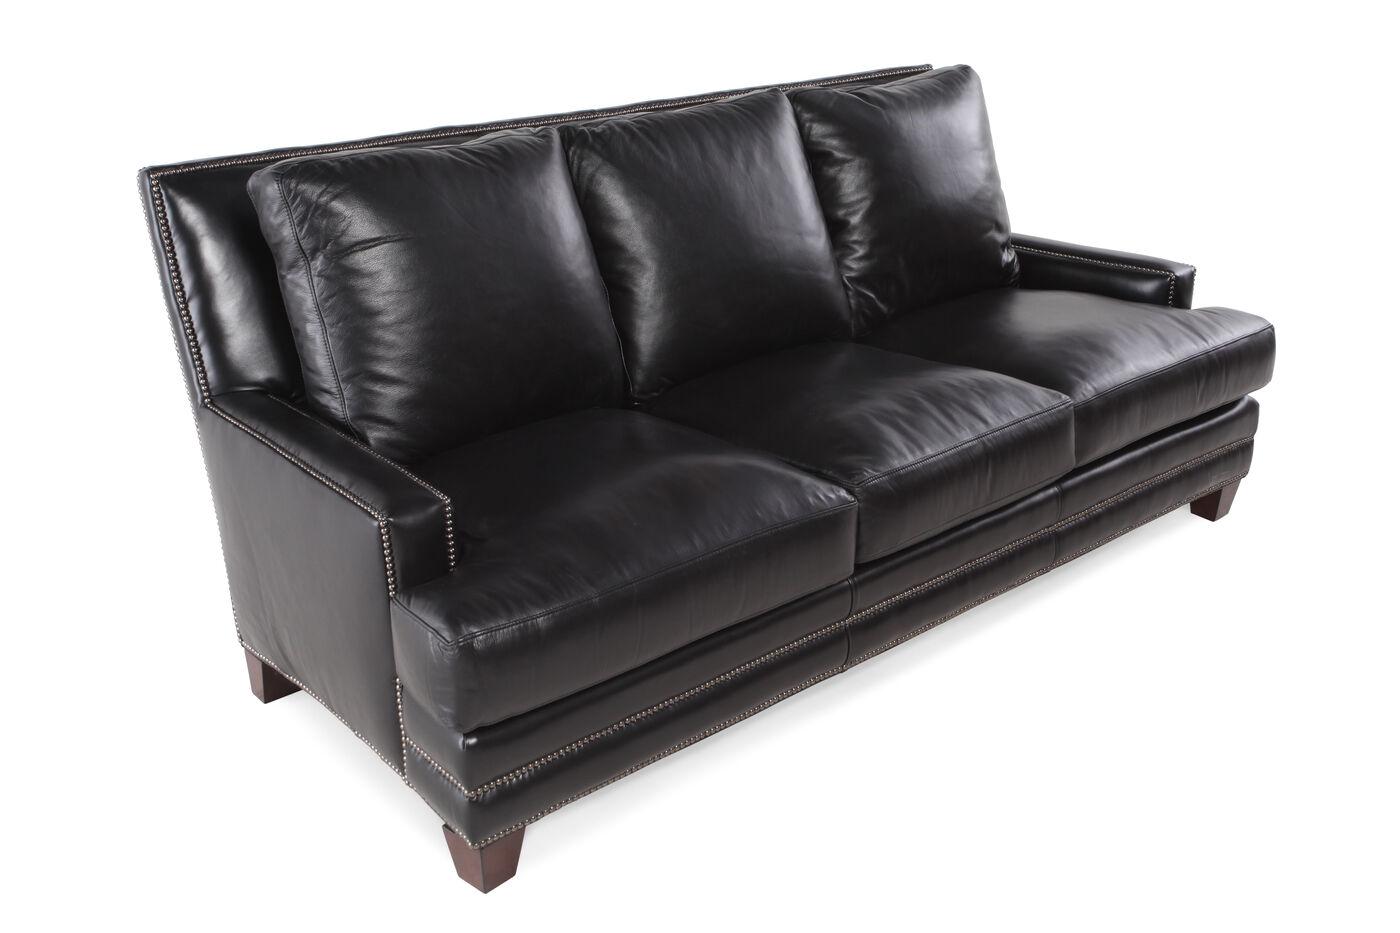 Henredon Leather Sofa Mathis Brothers